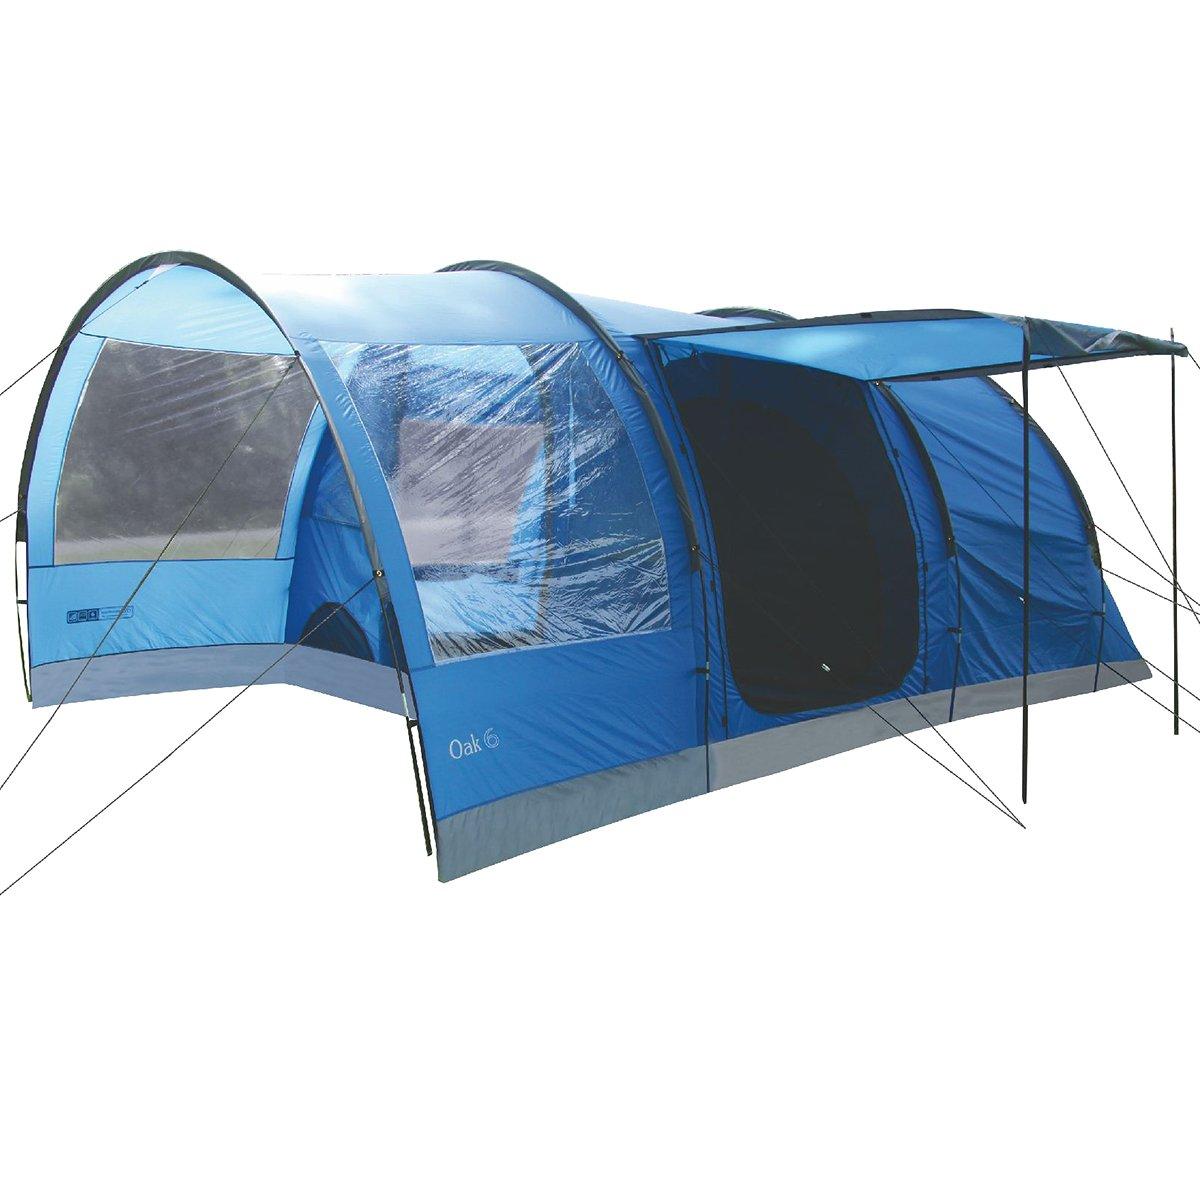 Tunnelzelt Oak 6 blau/grau